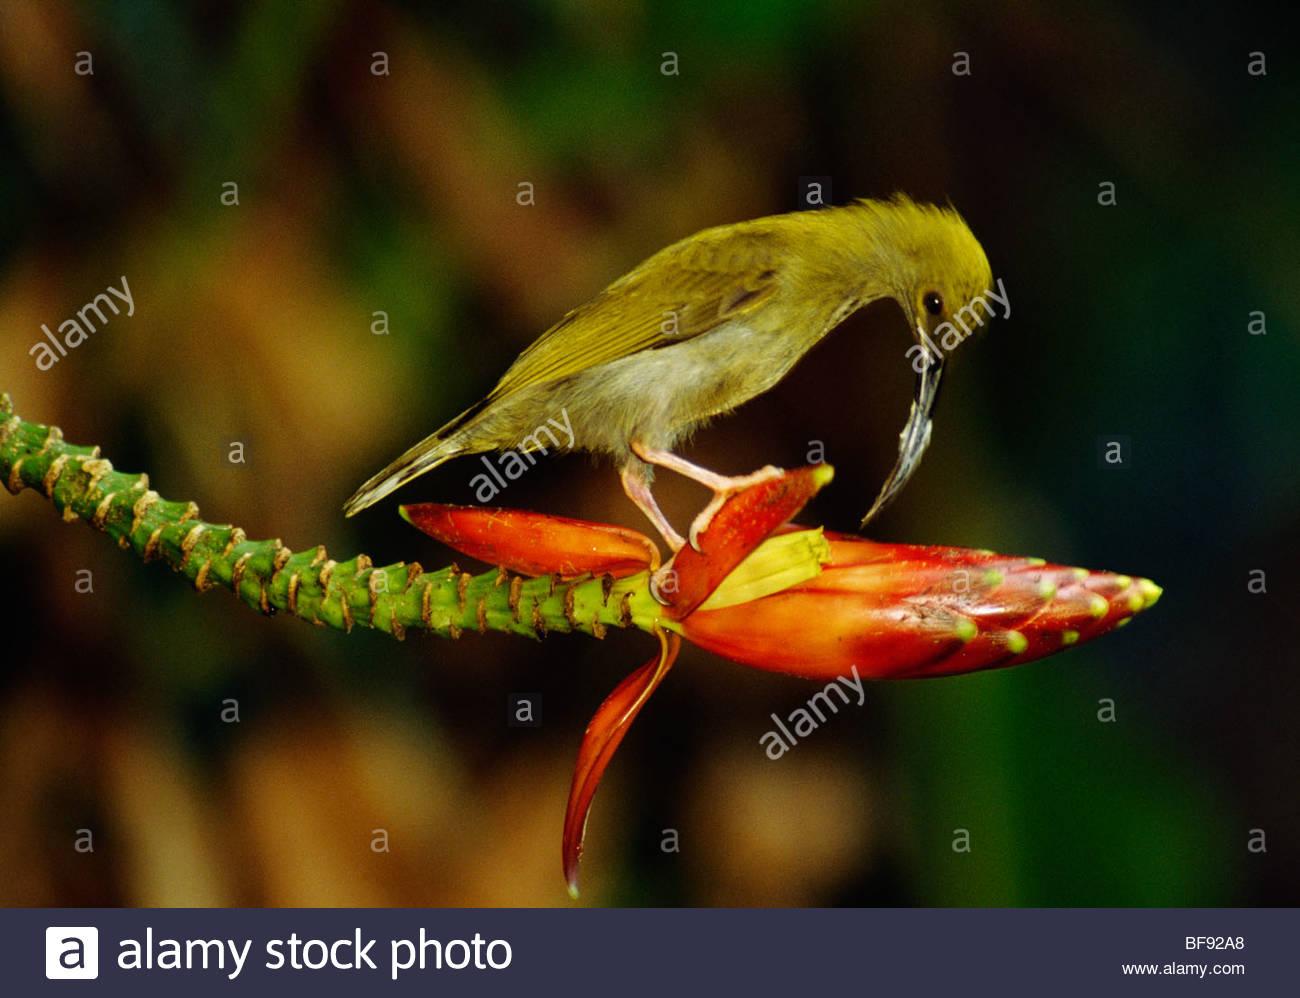 Long-billed spider hunter feeding on flower, Arachnothera robusta, Borneo - Stock Image